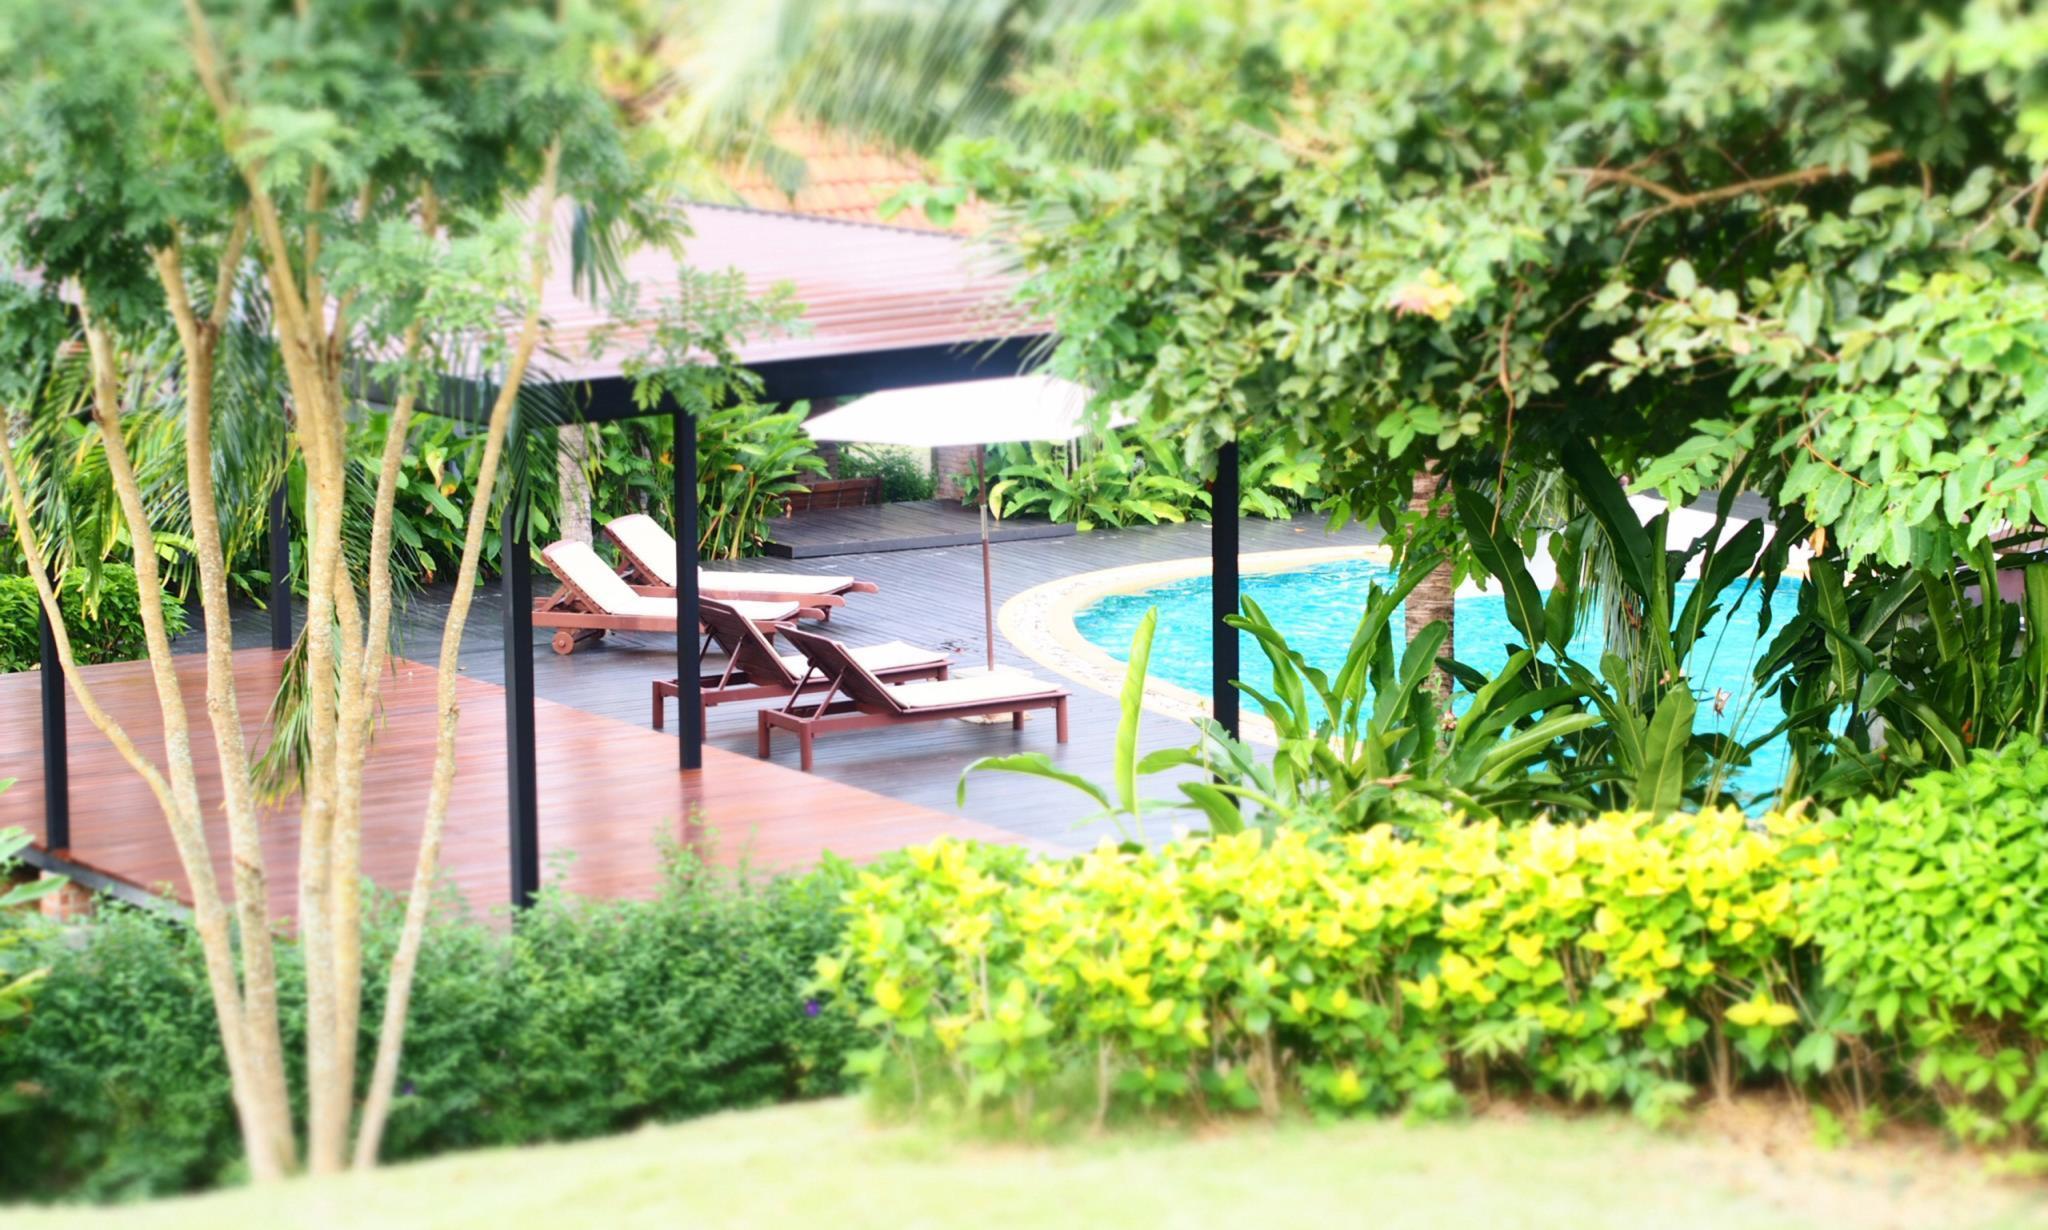 Chaw-Ka-Cher Tropicana Lanta Resort ฌ ทรอปิคาน่า ลันตา รีสอร์ท